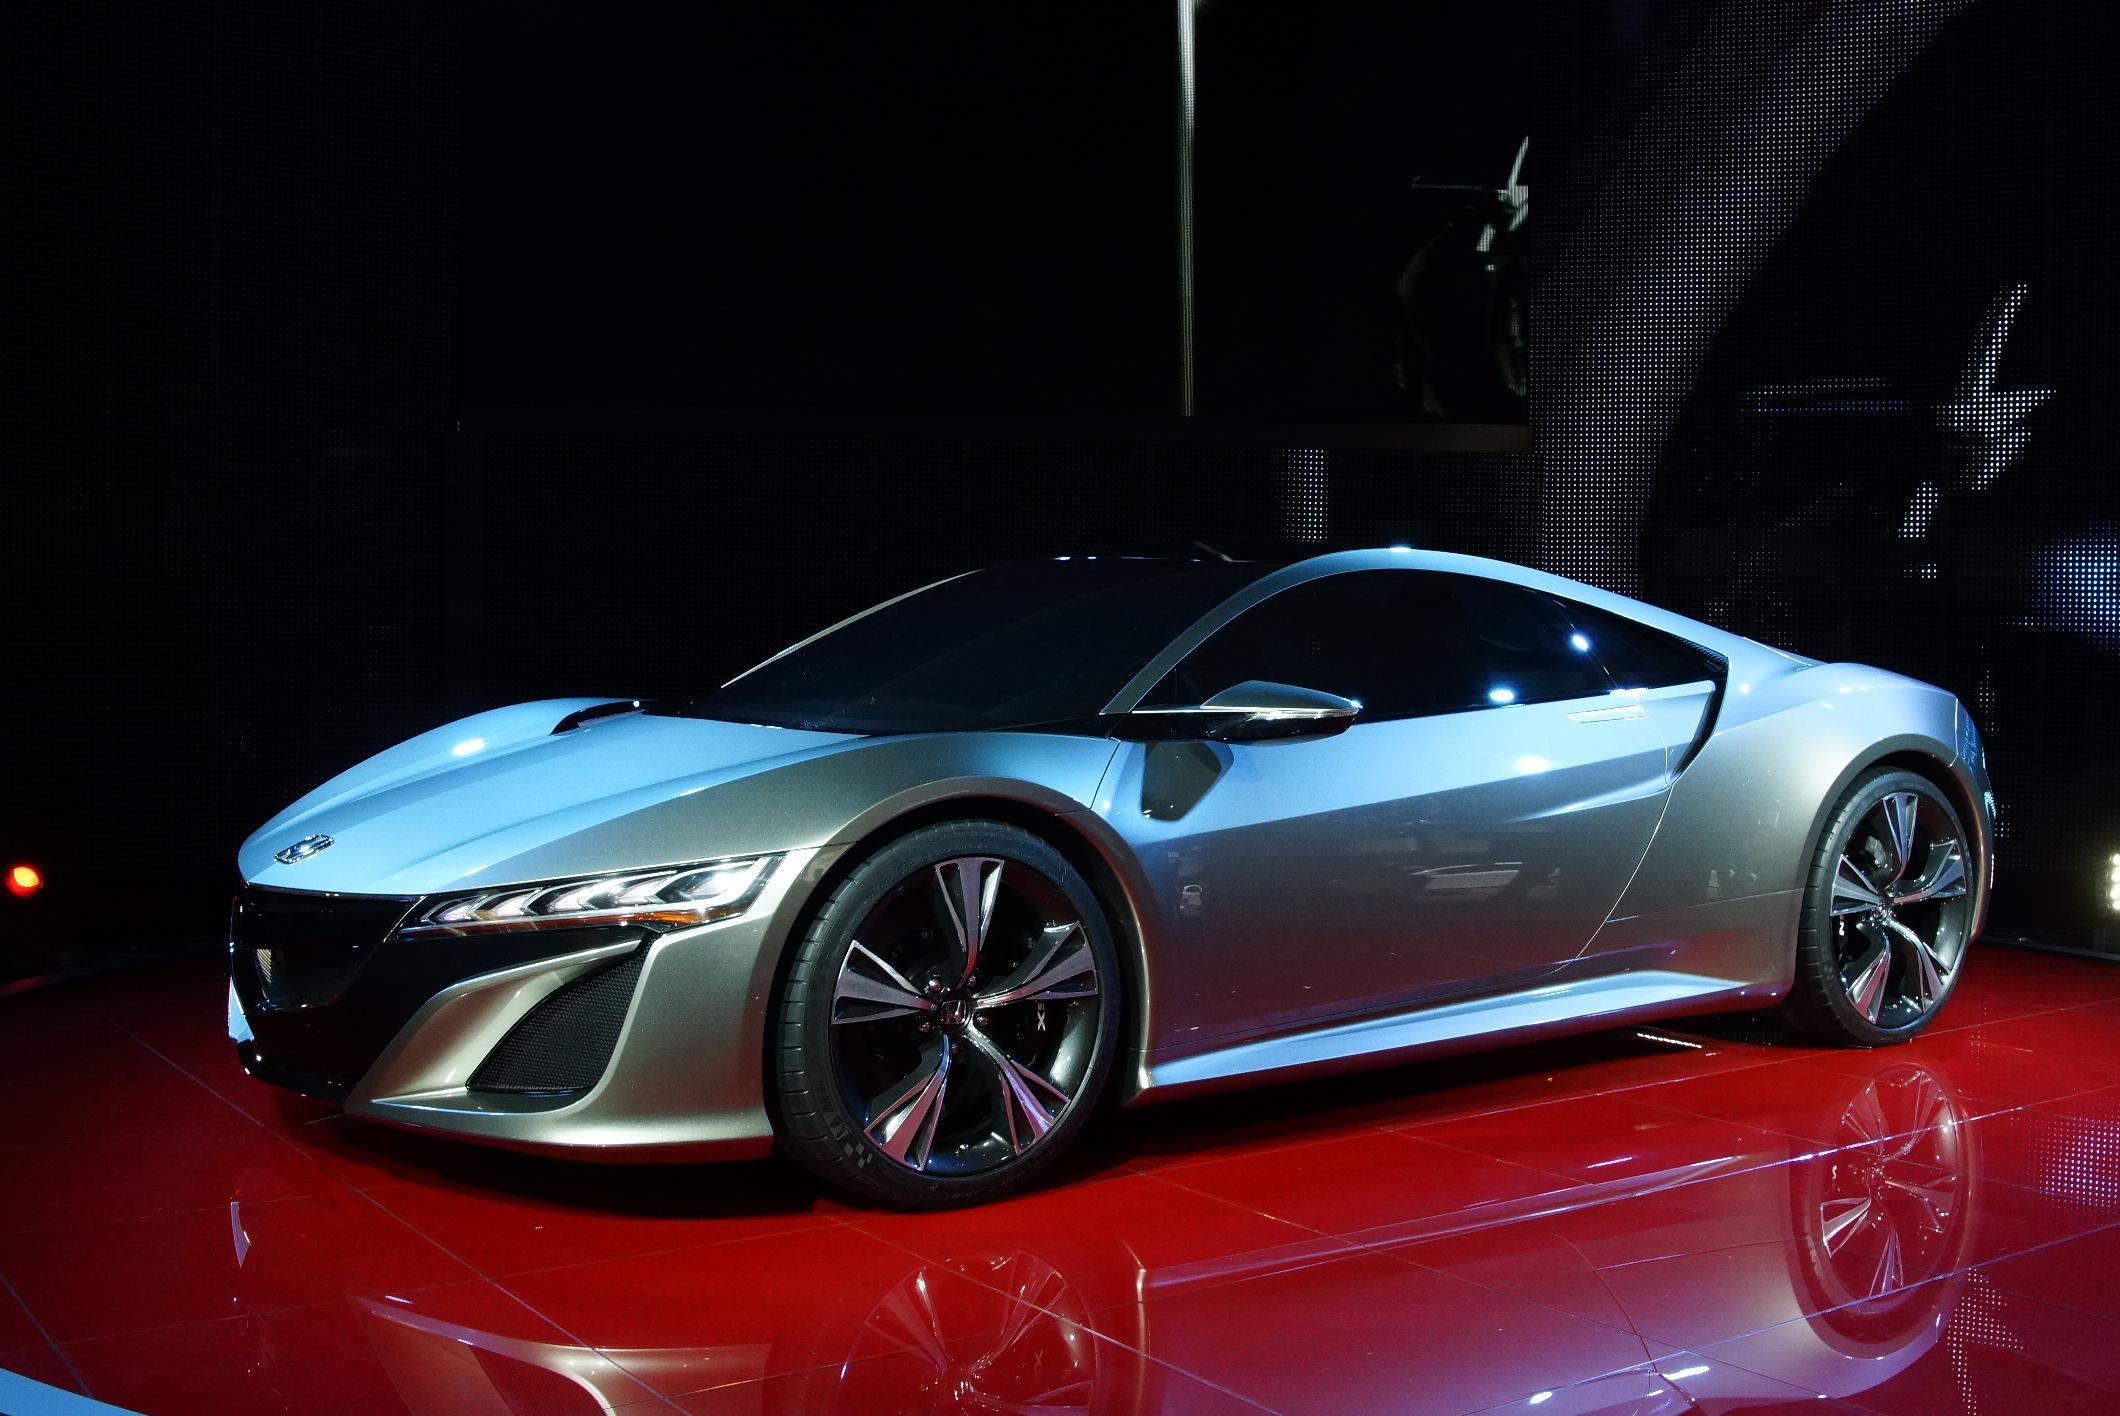 Honda NSX Geneva 2012 Side